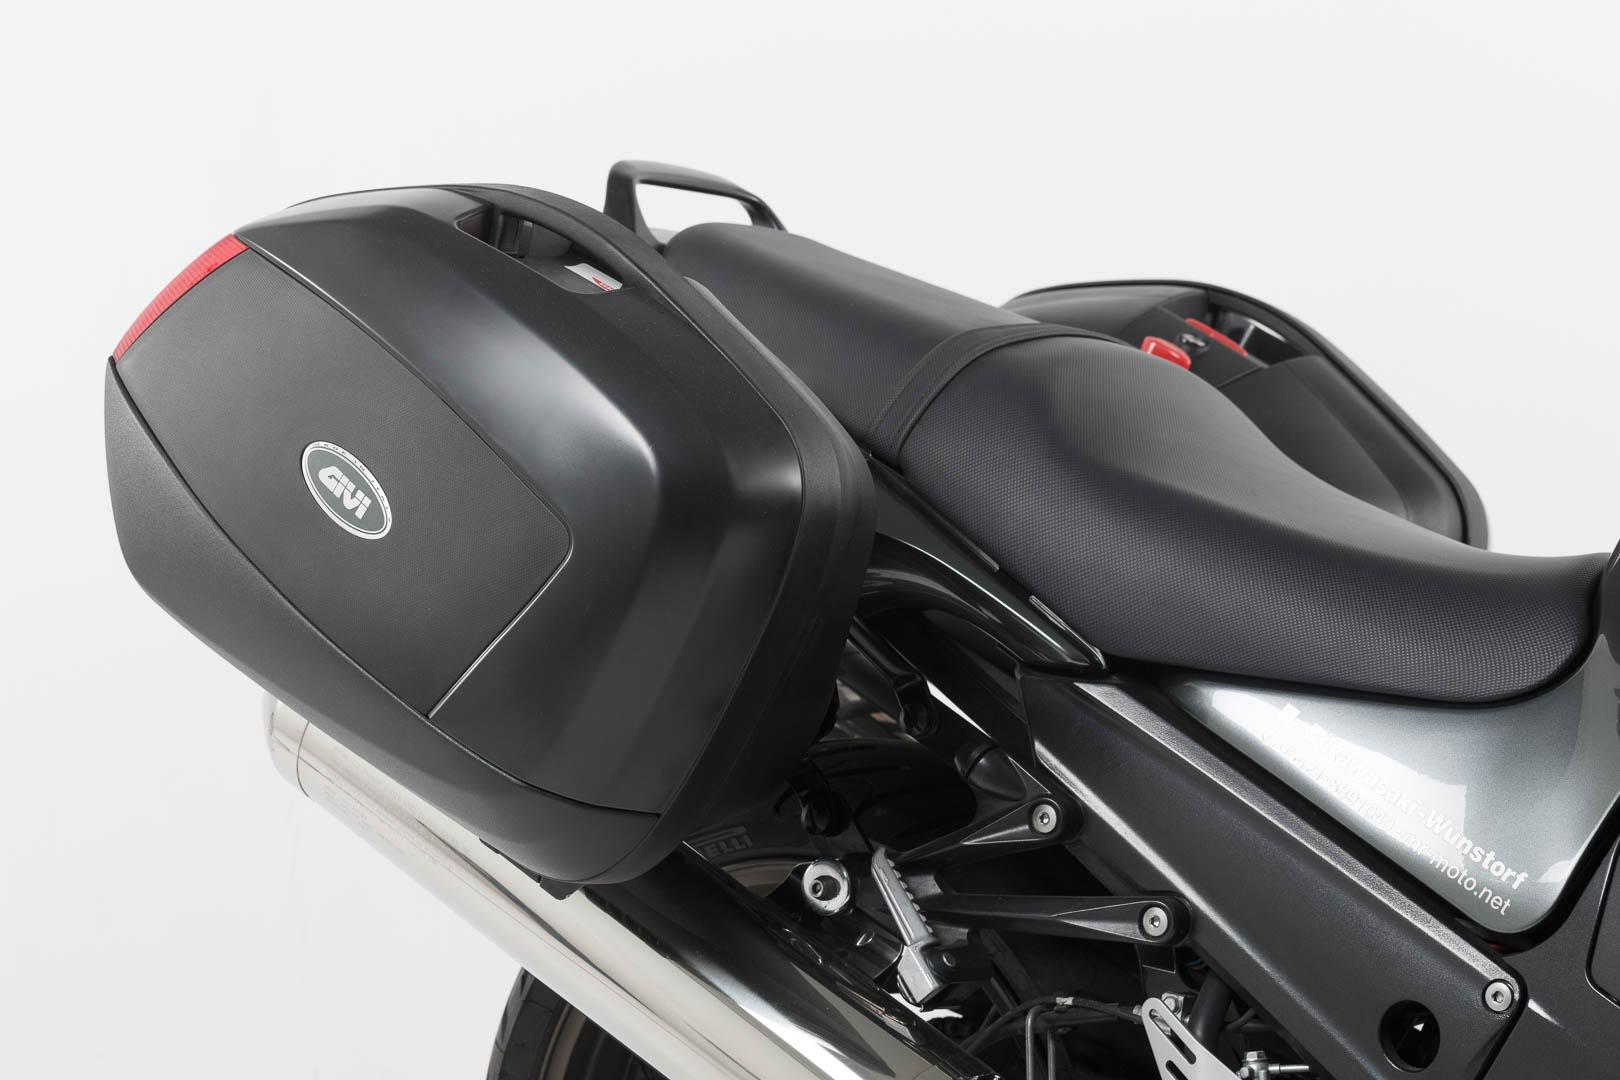 SW-Motech Quick-Lock Profile sivutelinesarja Kawasaki ZZR1400